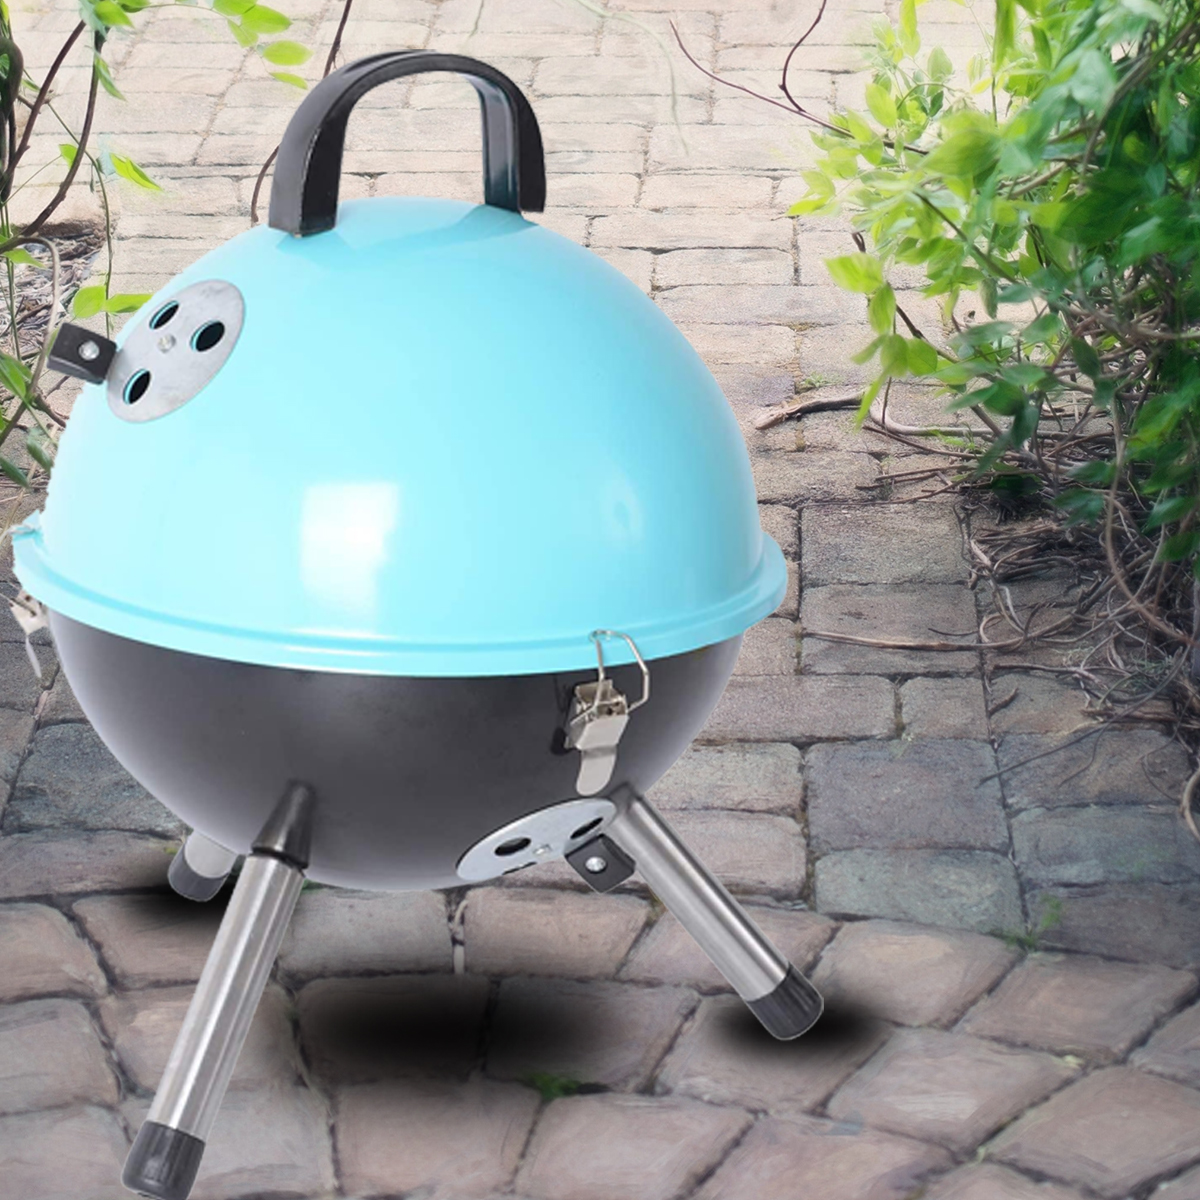 thumbnail 20 - Outdoor Backyard Cooking Mini Portable Charcoal BBQ Grill Bottom Storage